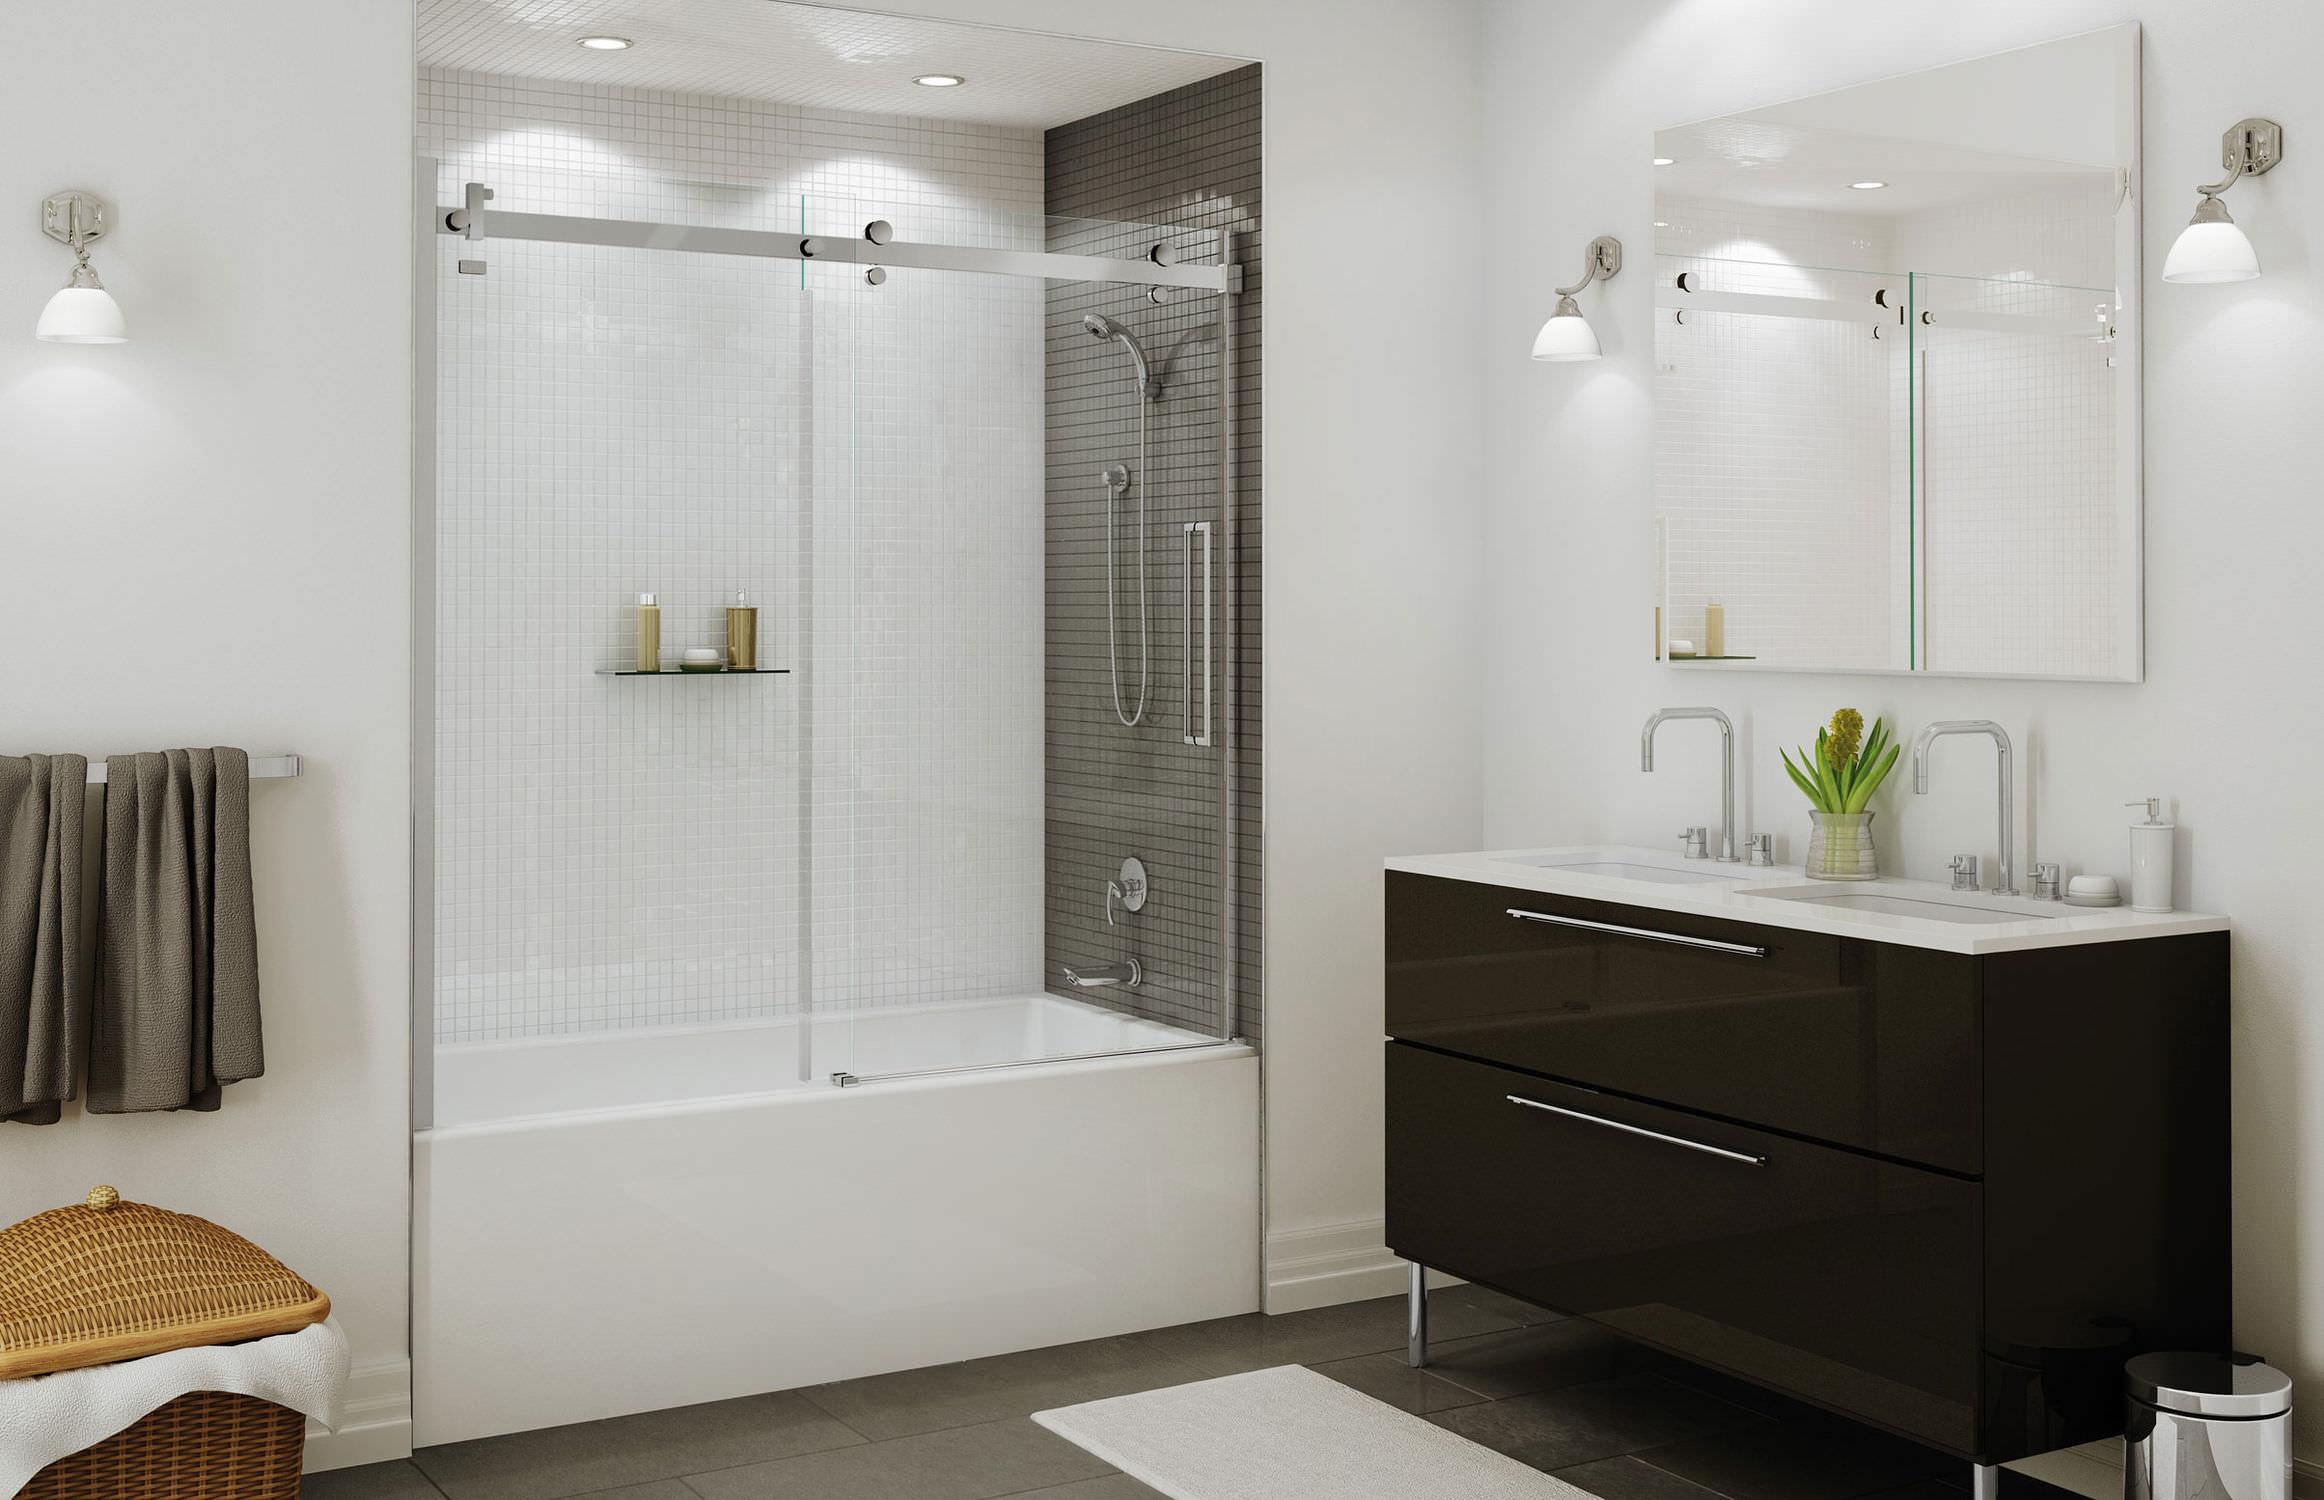 Paradoccia Vasca Da Bagno.Paradoccia Per Vasca Scorrevole Halo Maax Bathroom Video